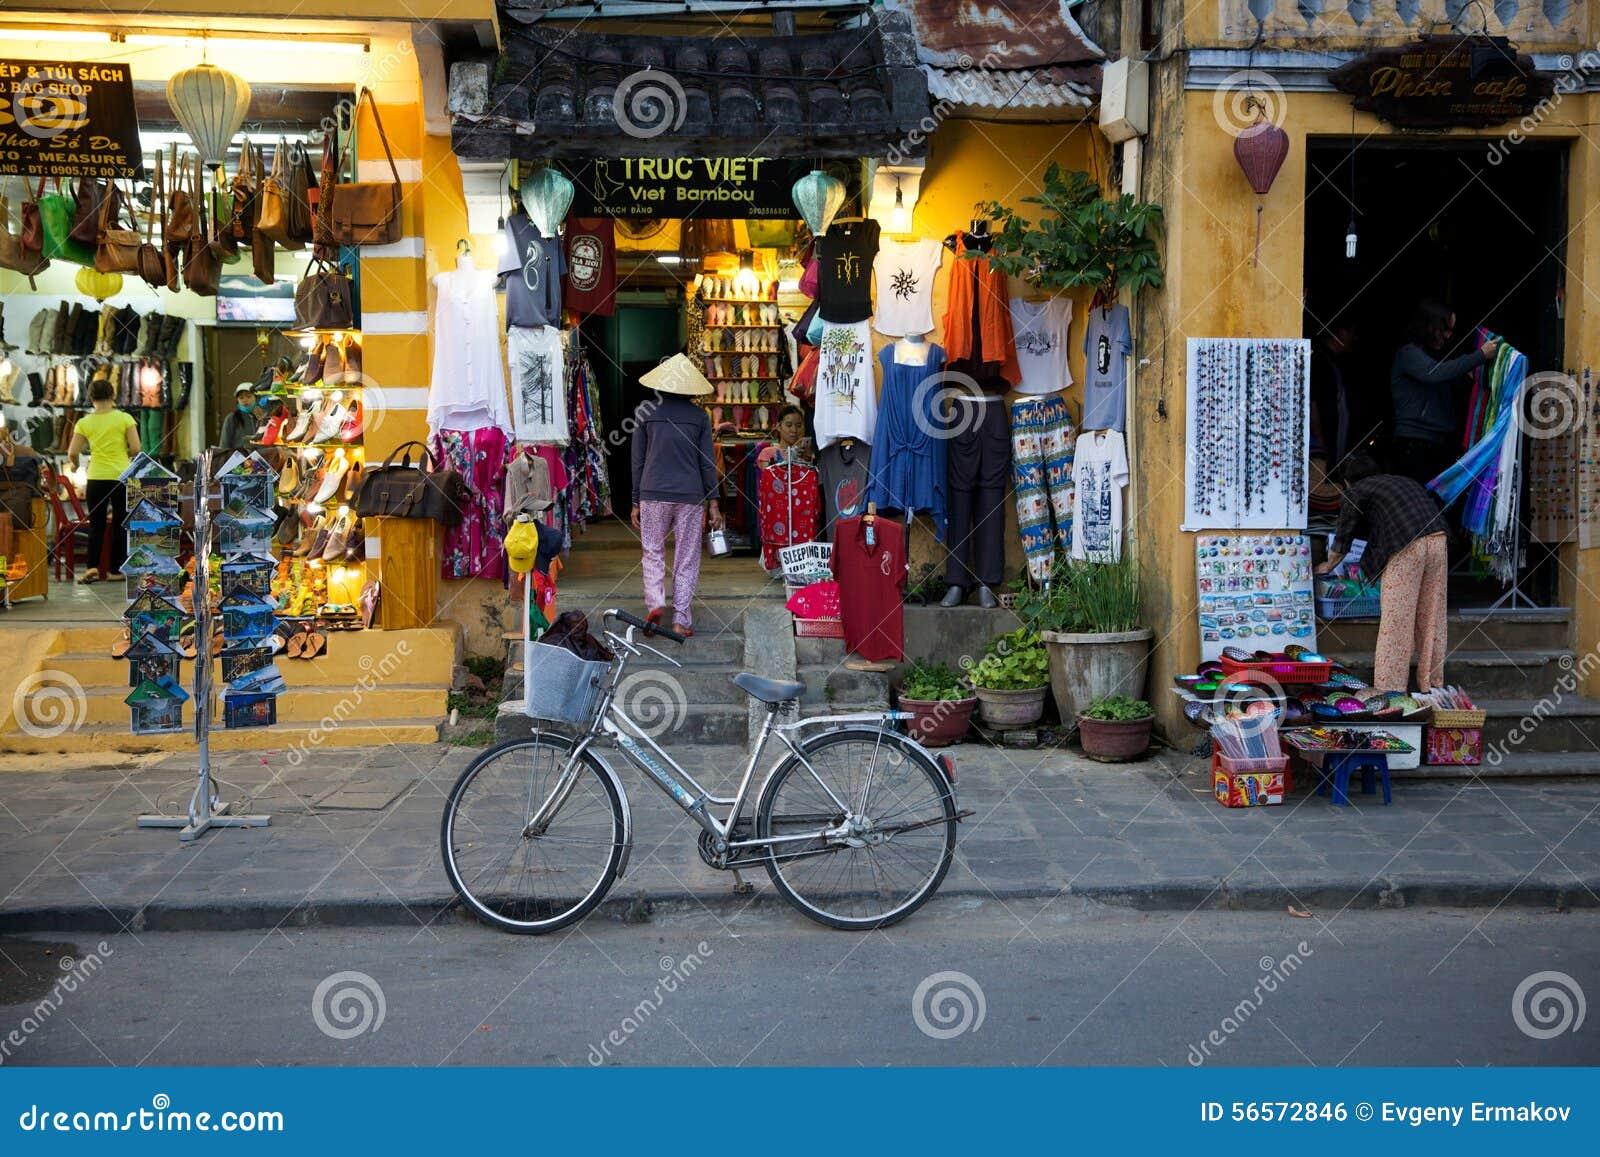 Download Γυναίκα στο παραδοσιακό κωνικό καπέλο στην οδό αγοράς Hoi Εκδοτική Εικόνες - εικόνα από τουρισμός, πώληση: 56572846